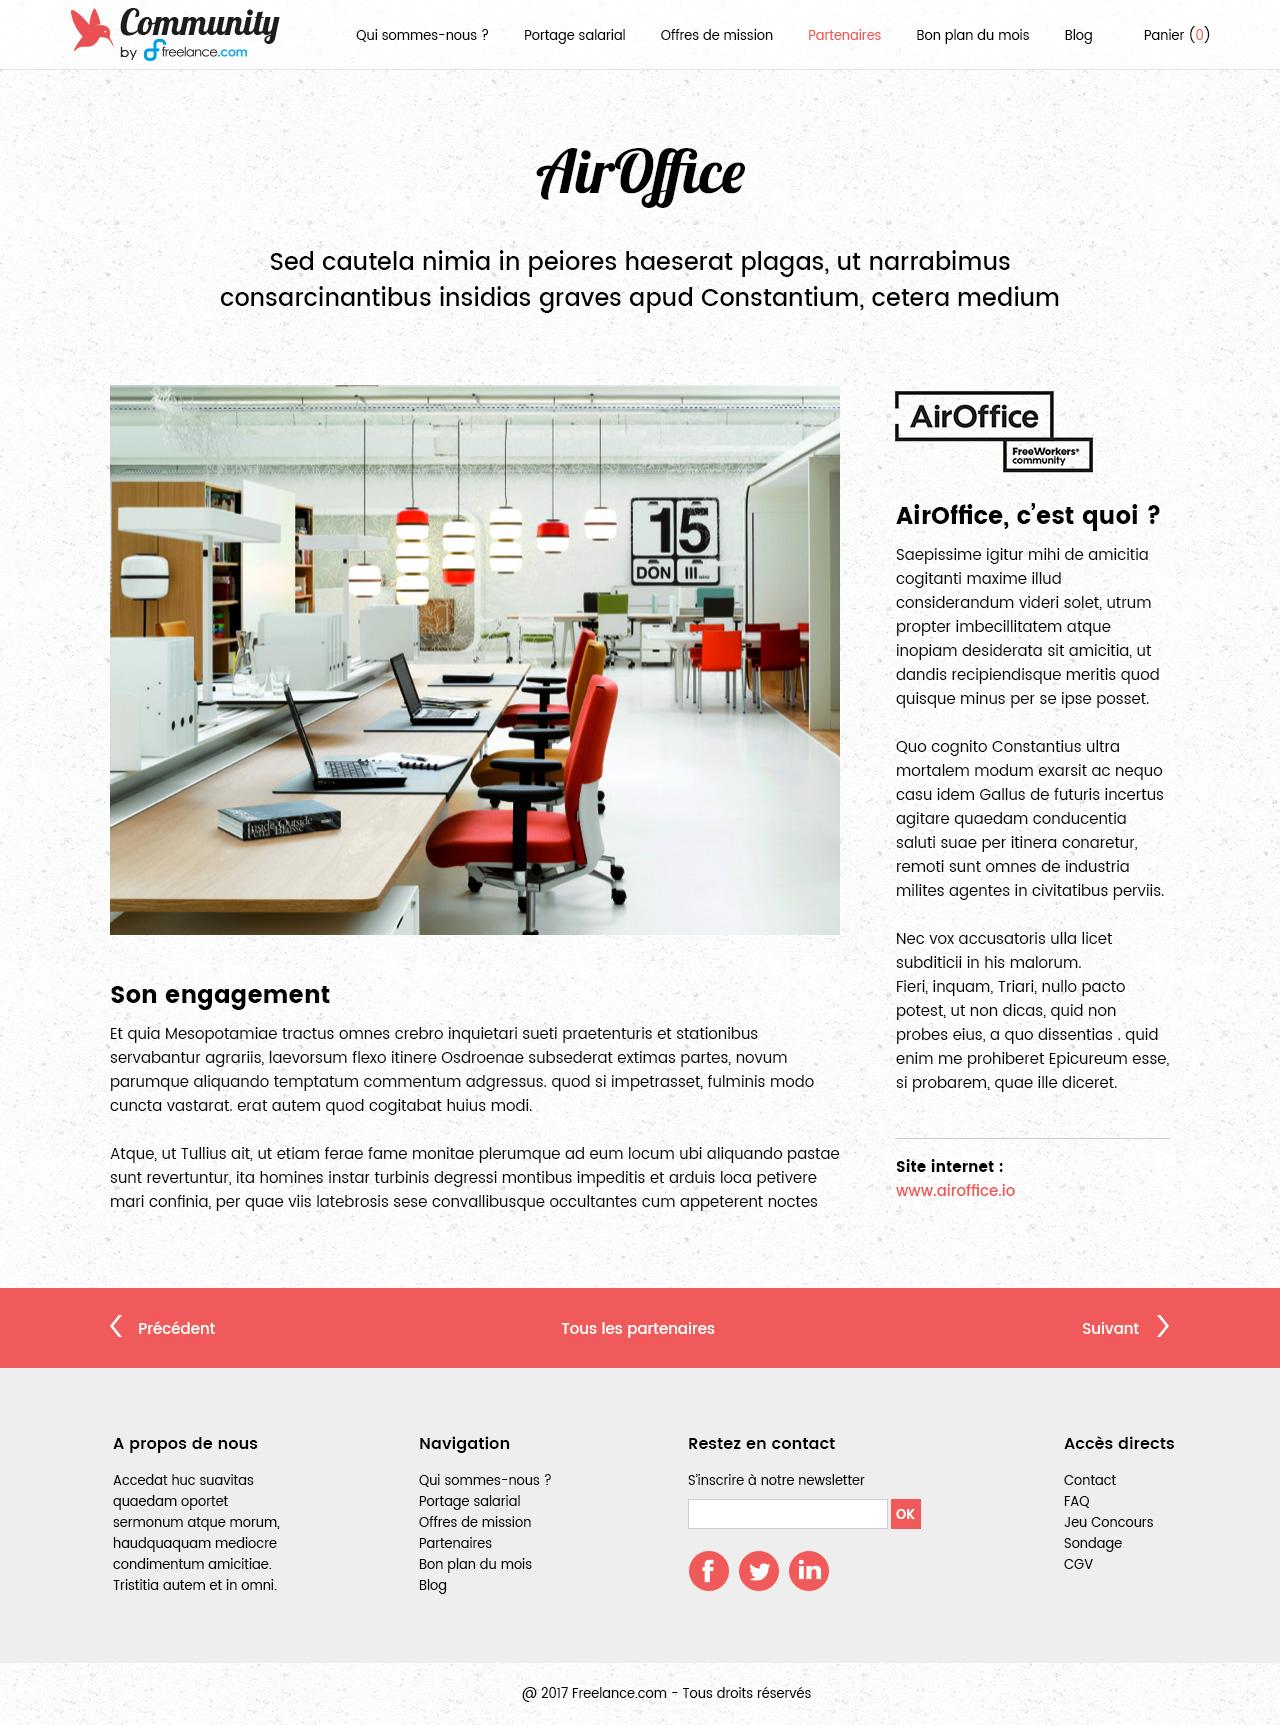 Freelance.com – Community – Page